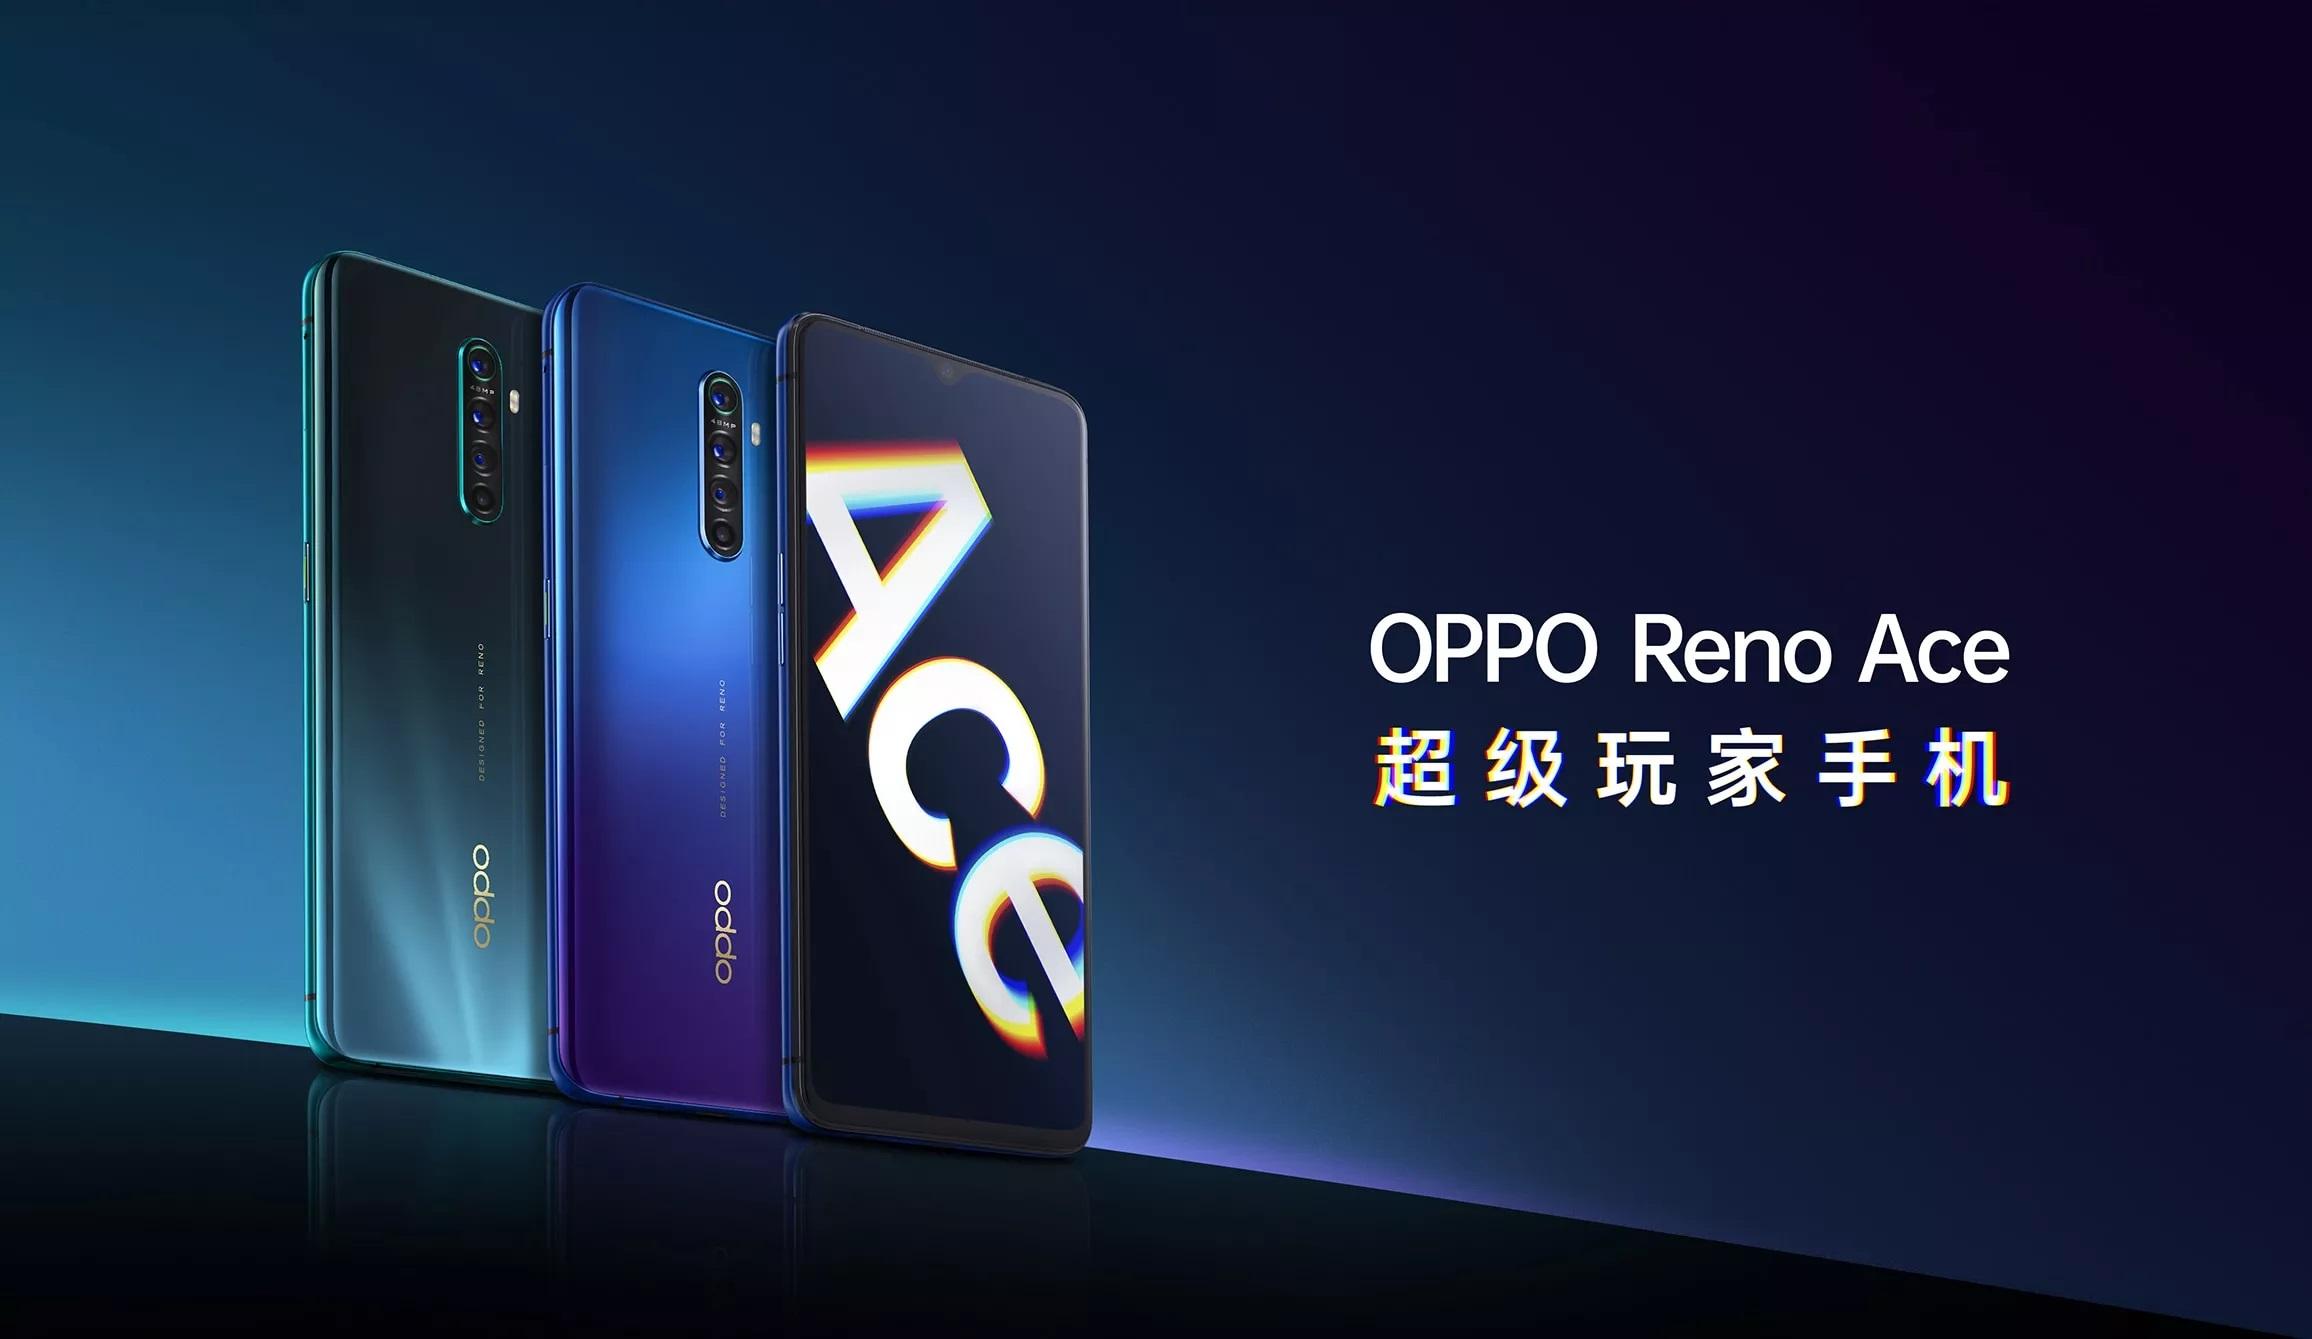 smartfon Oppo Reno Ace